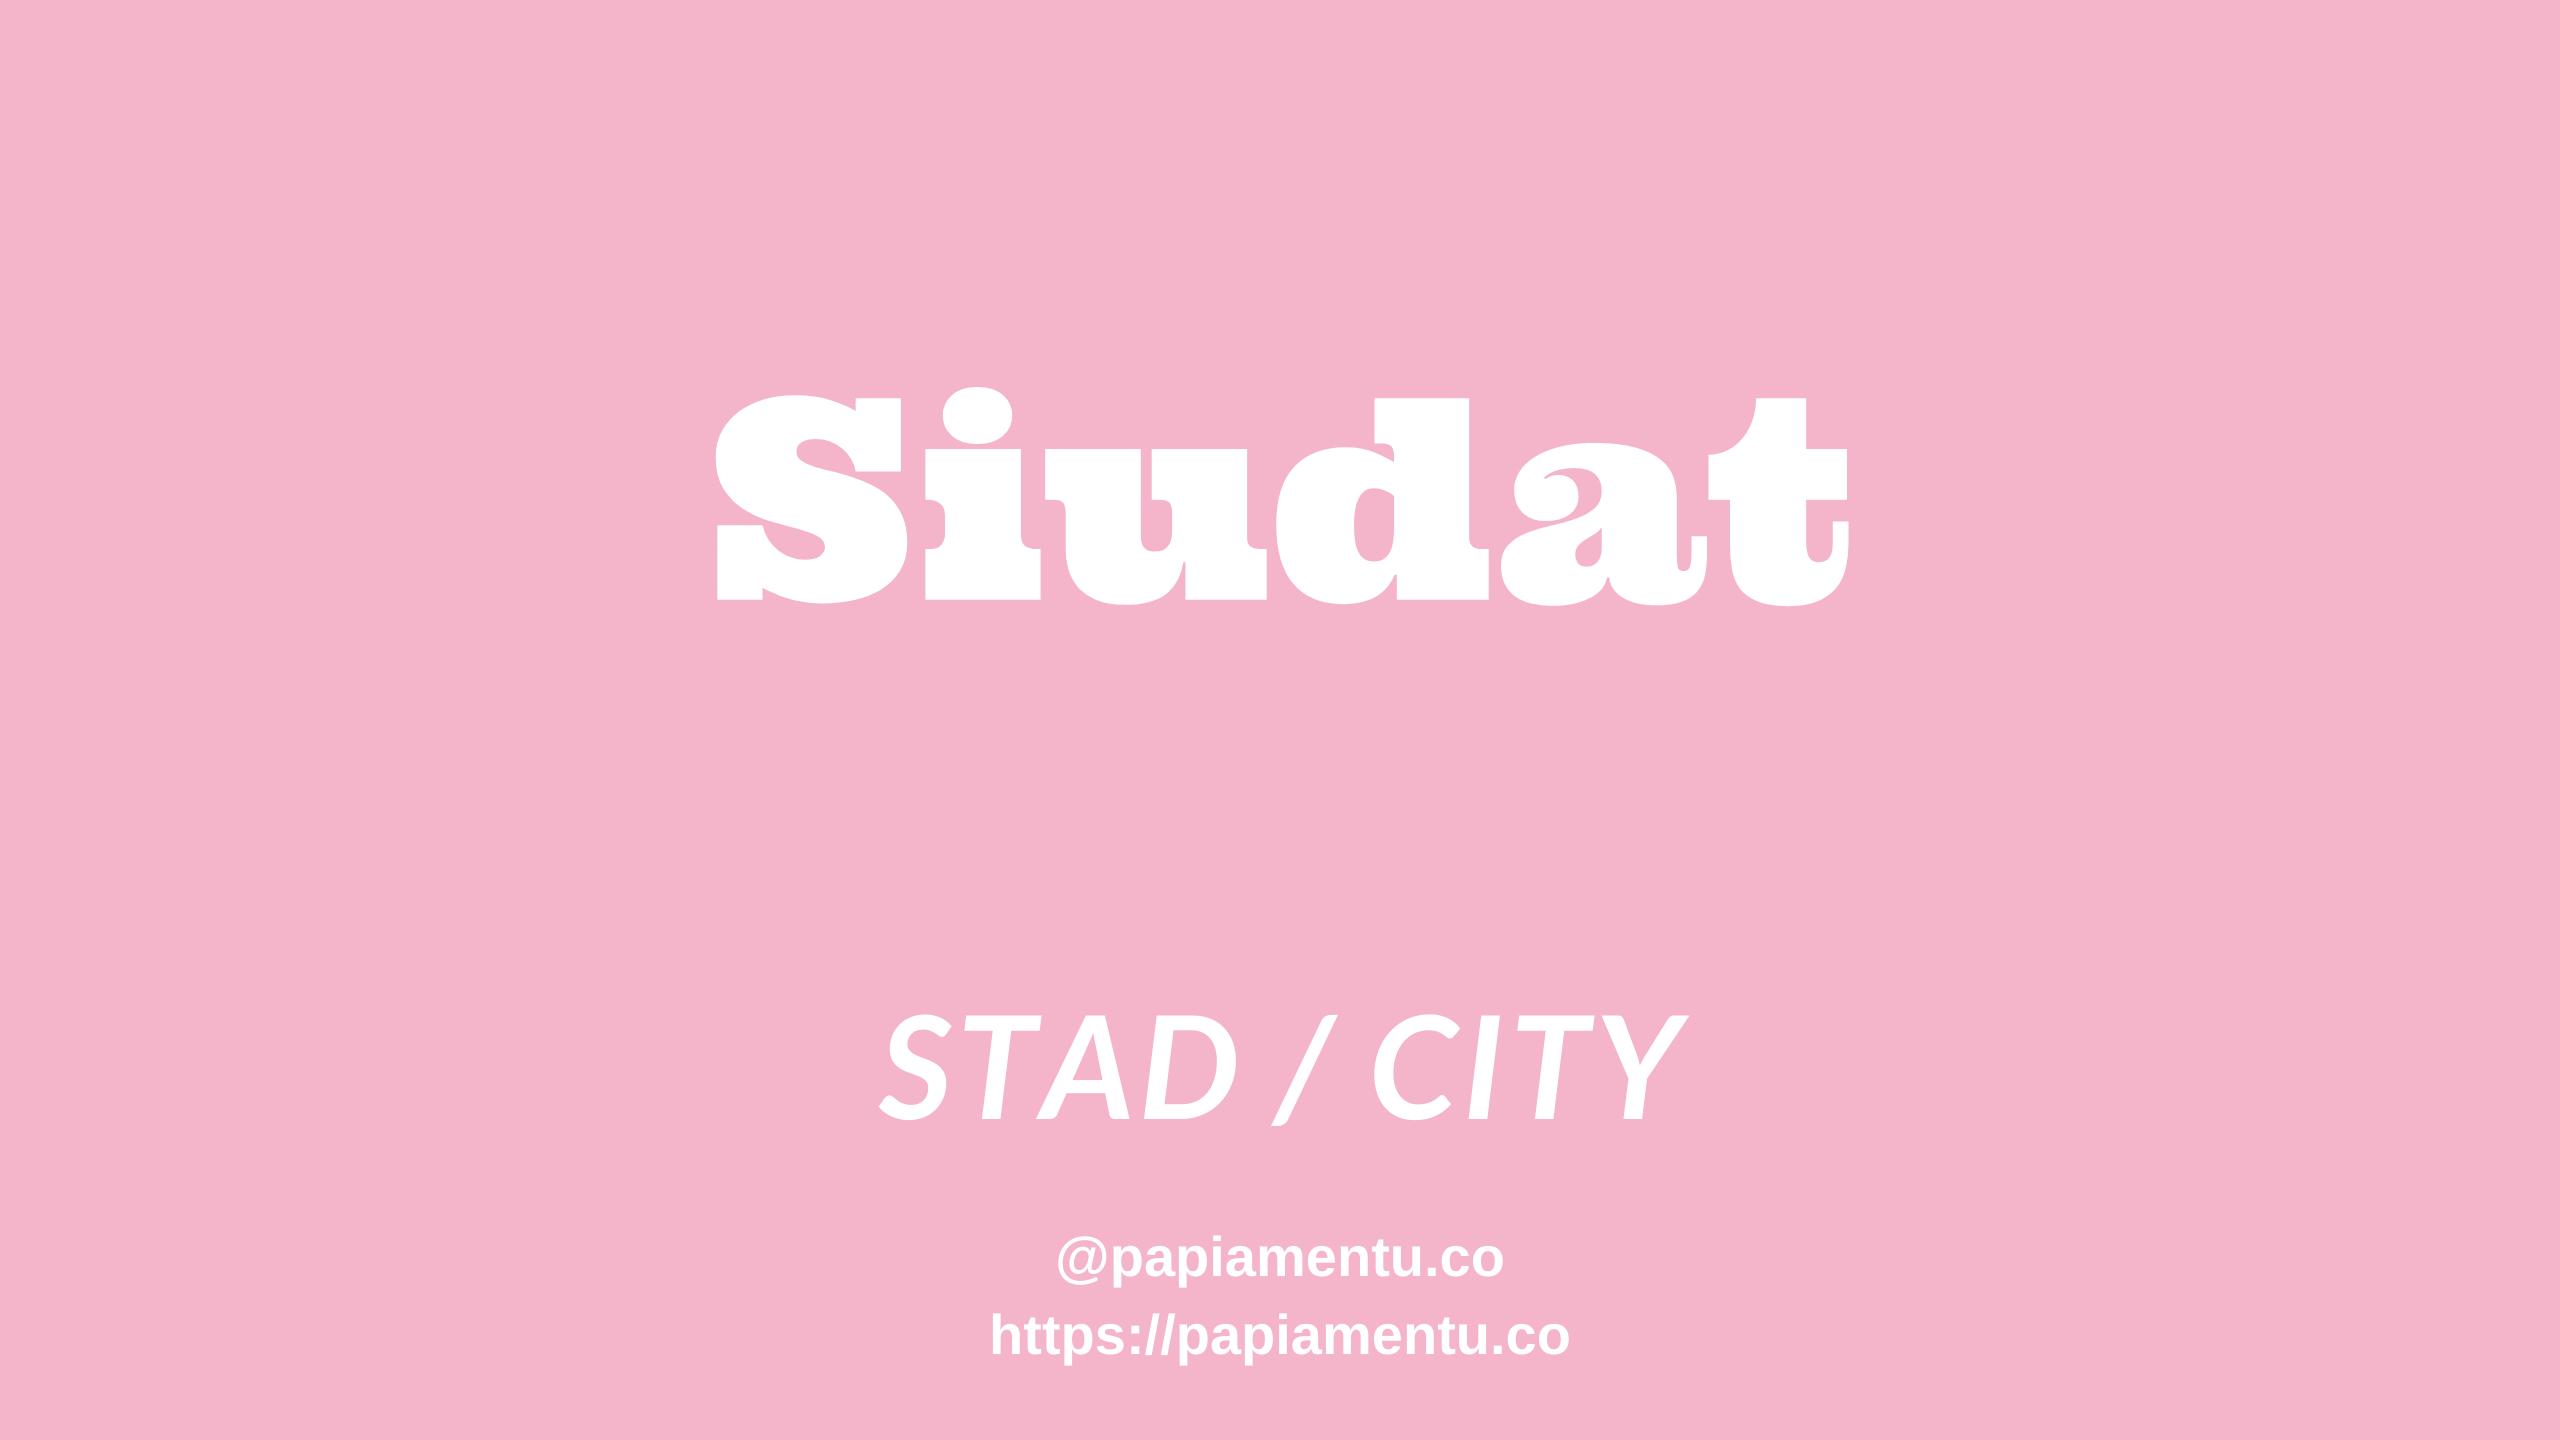 Siudat - Stad in Papiamentu / in het Papiaments